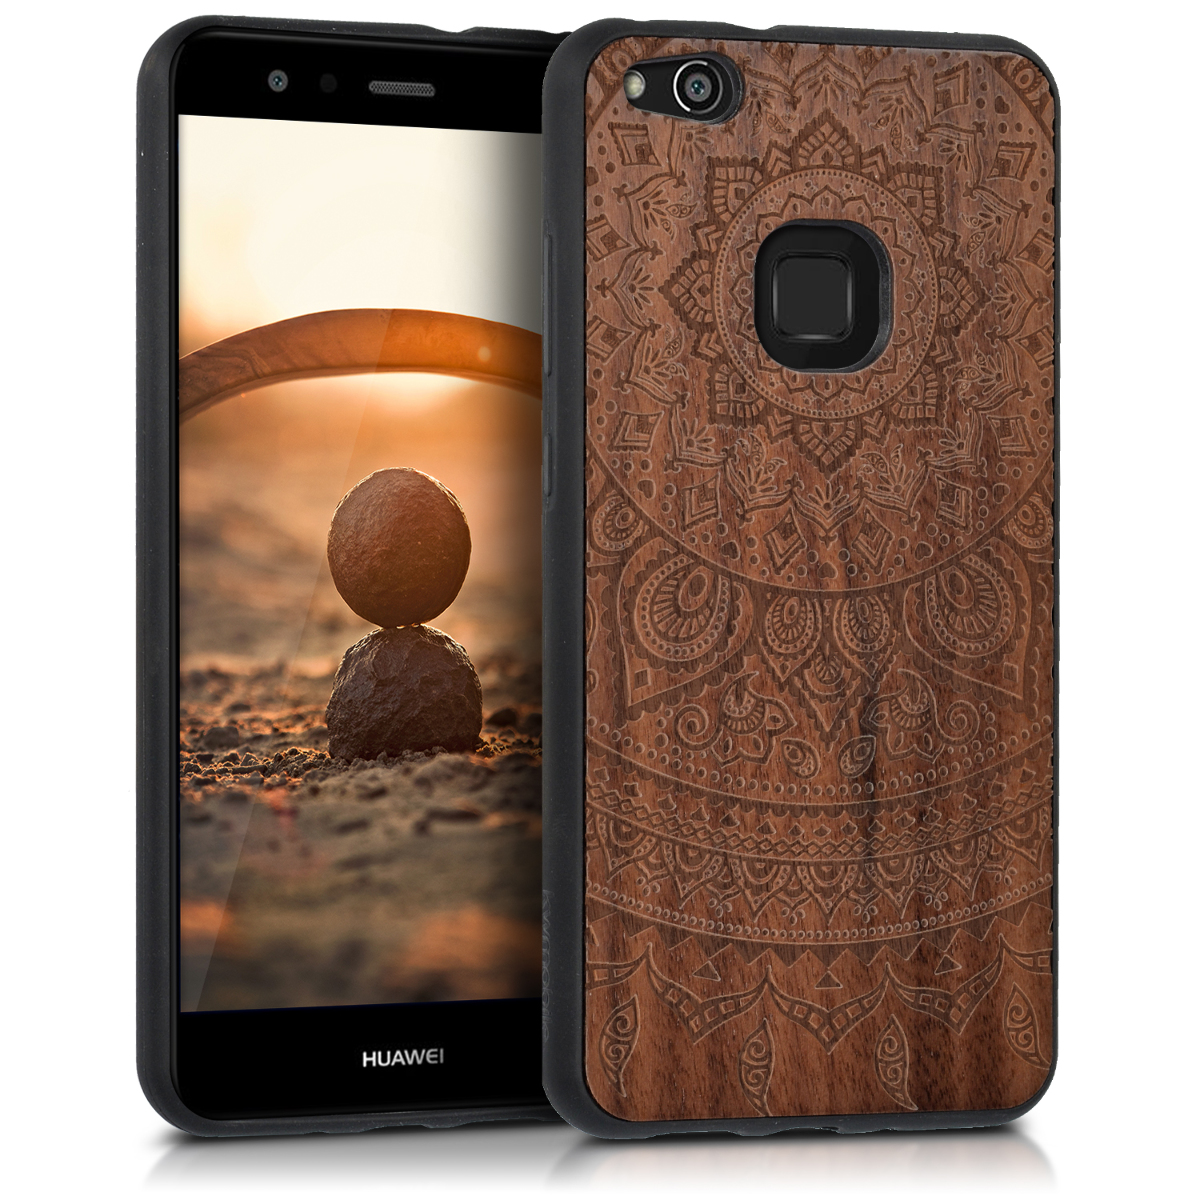 KW Ξύλινη Θήκη Huawei P10 Lite - Indian Sun - Dark Brown (41377.01)